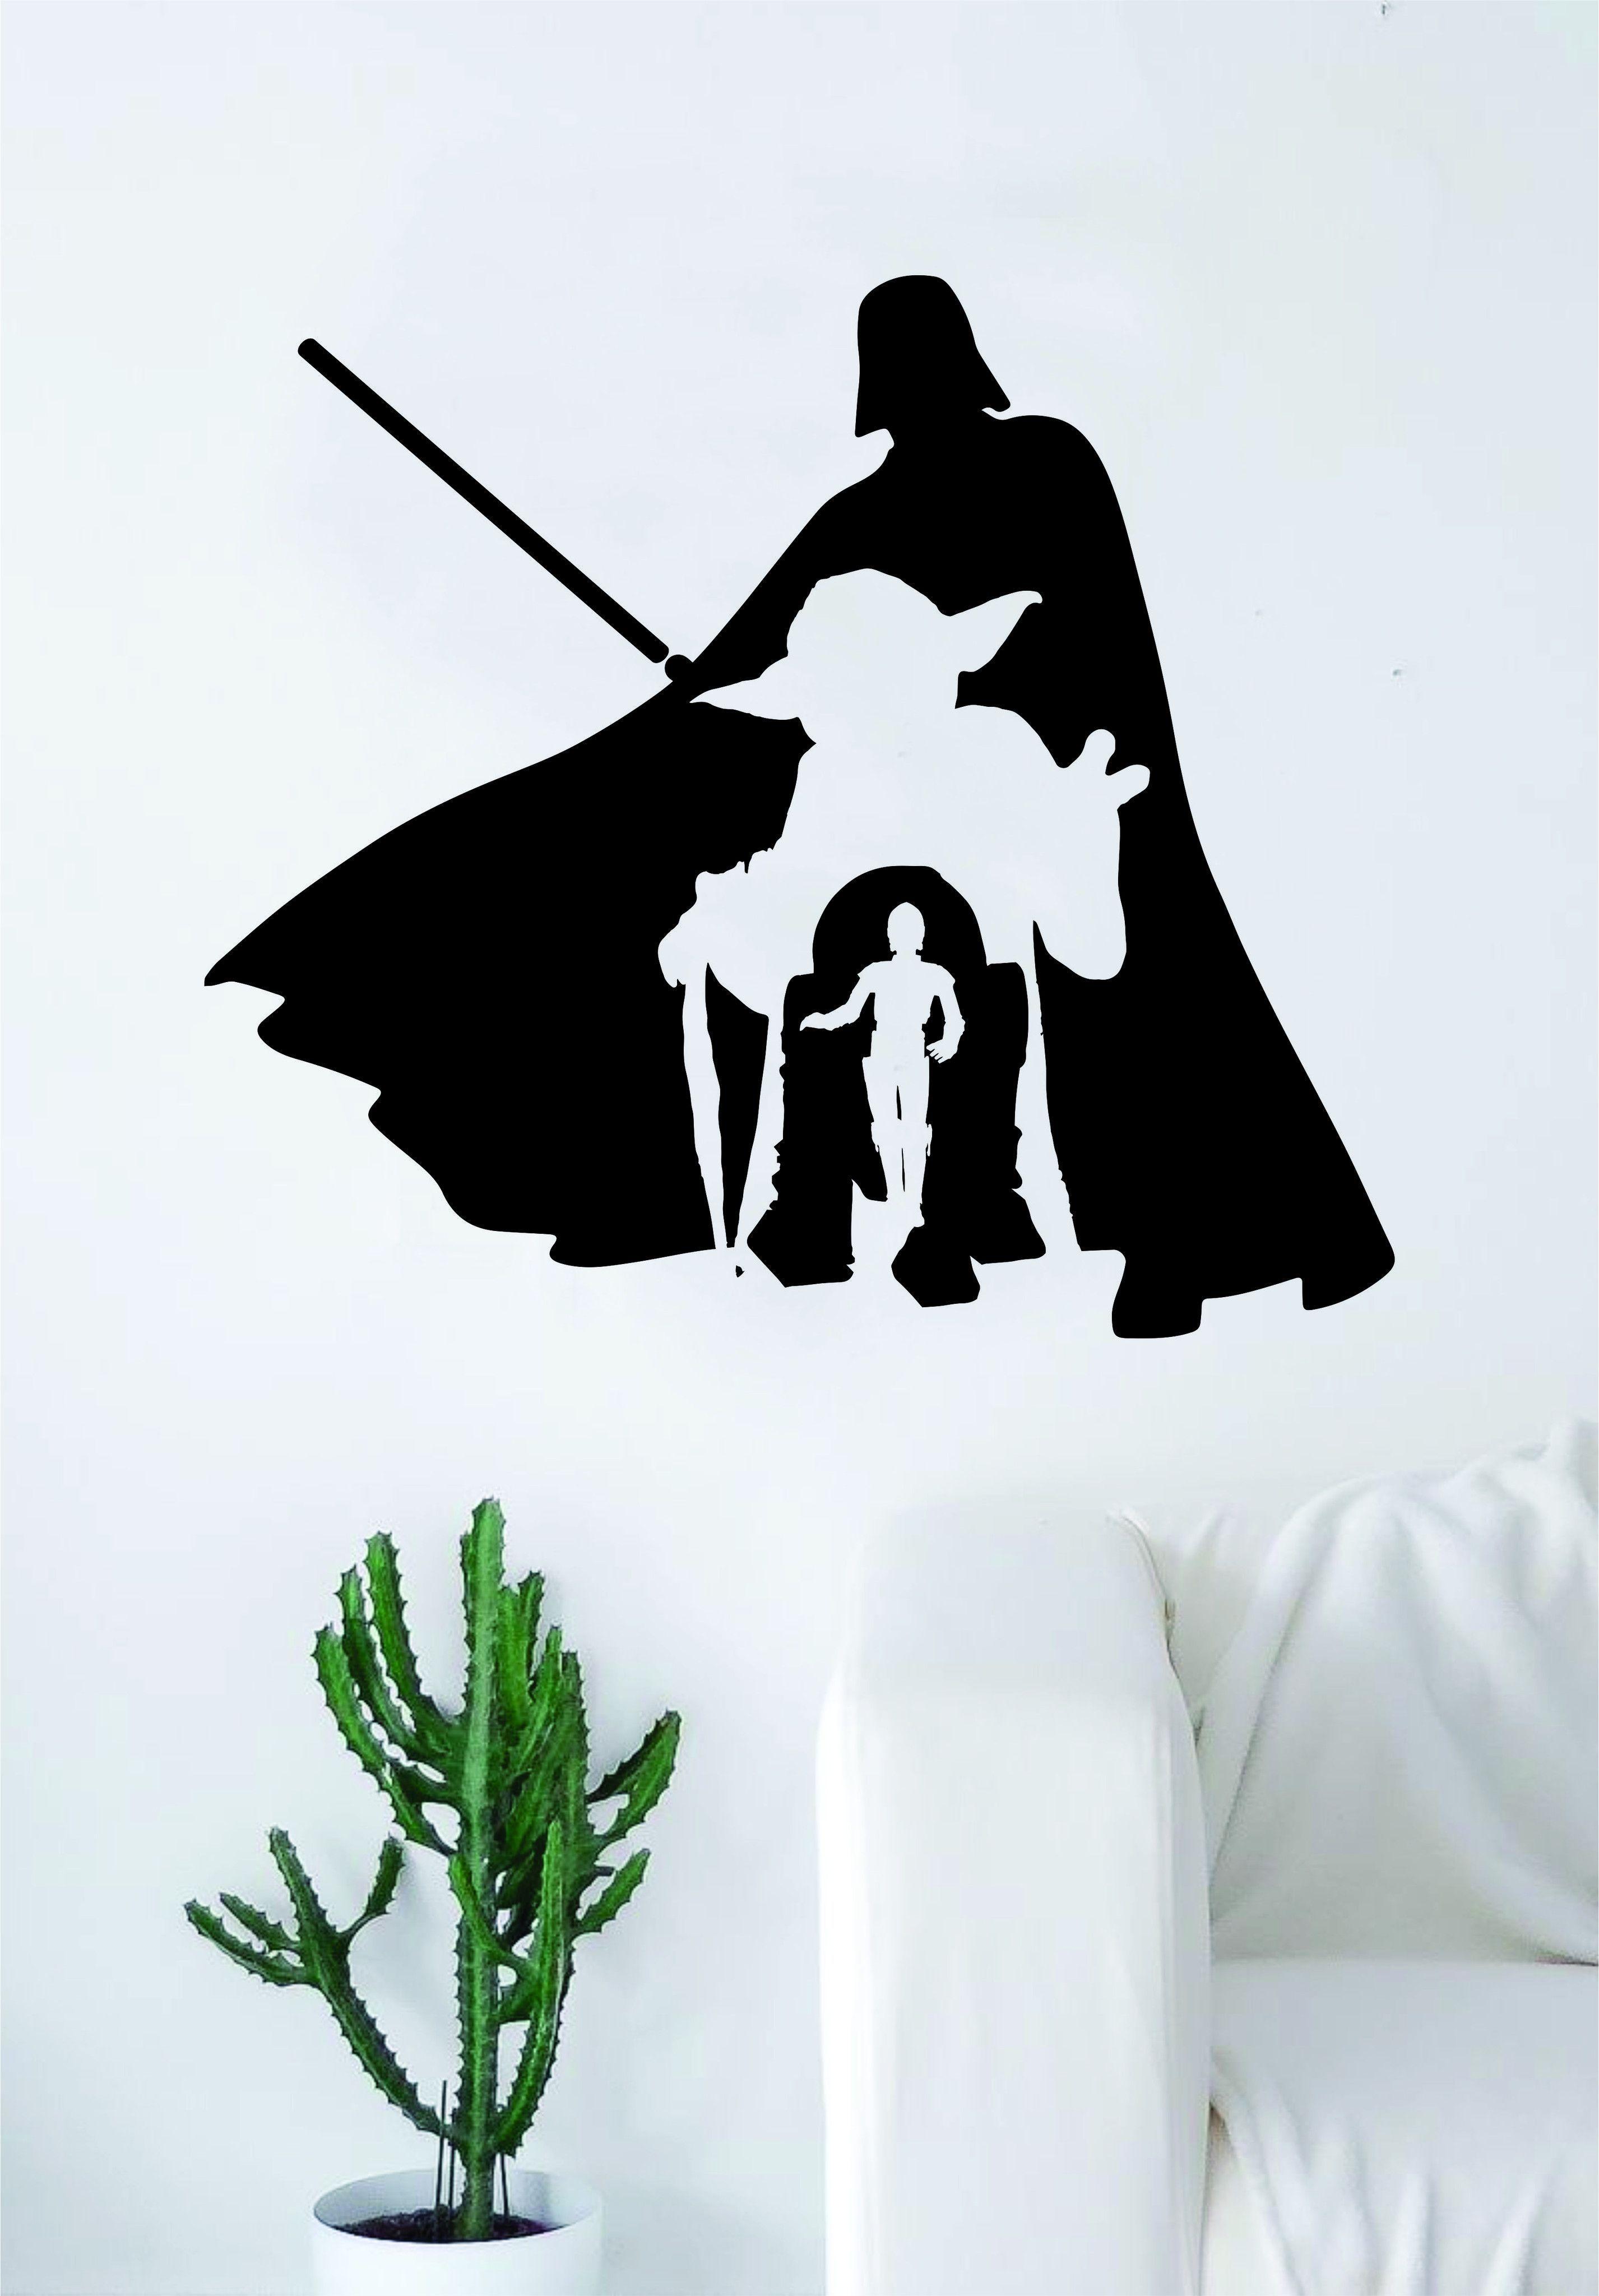 Star wars collage v2 quote decal sticker wall vinyl decor art room teen kids movies darth vader yoda r2d2 c3p0 jedi dark side